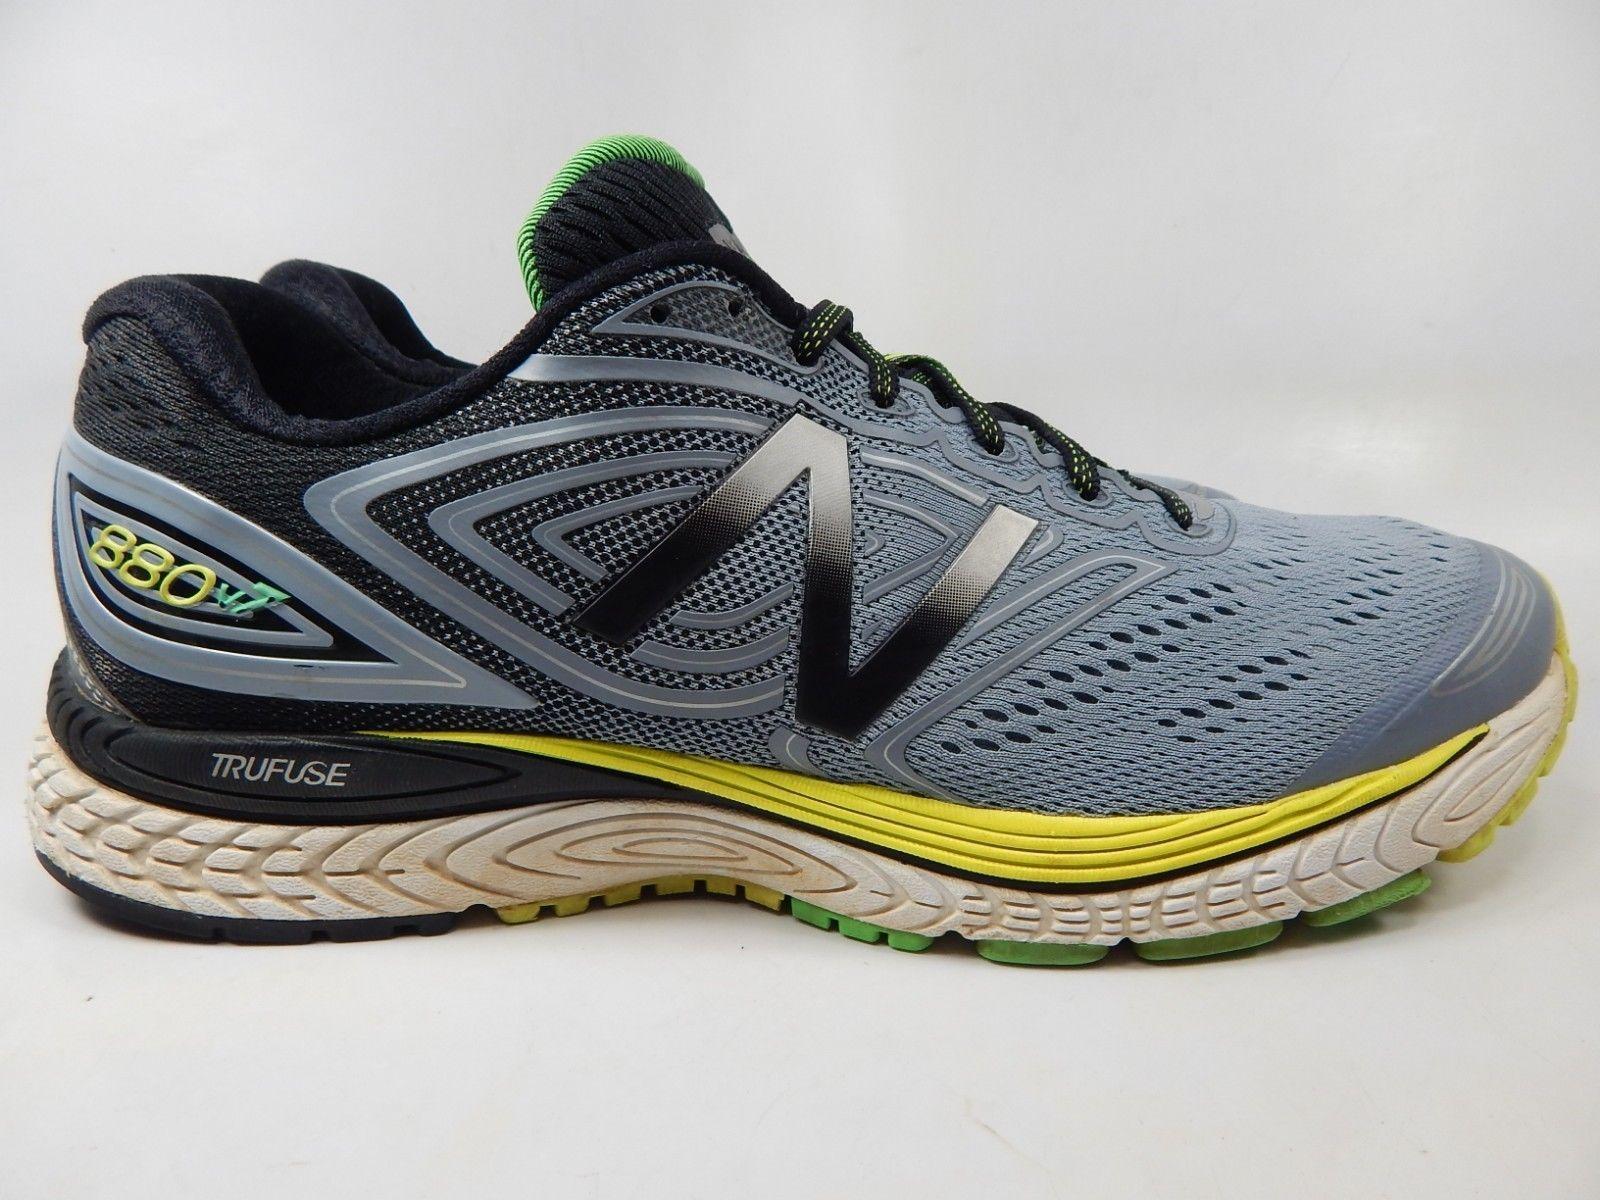 New Balance 880 v7 Size 13 M (D) EU 47.5 and similar items